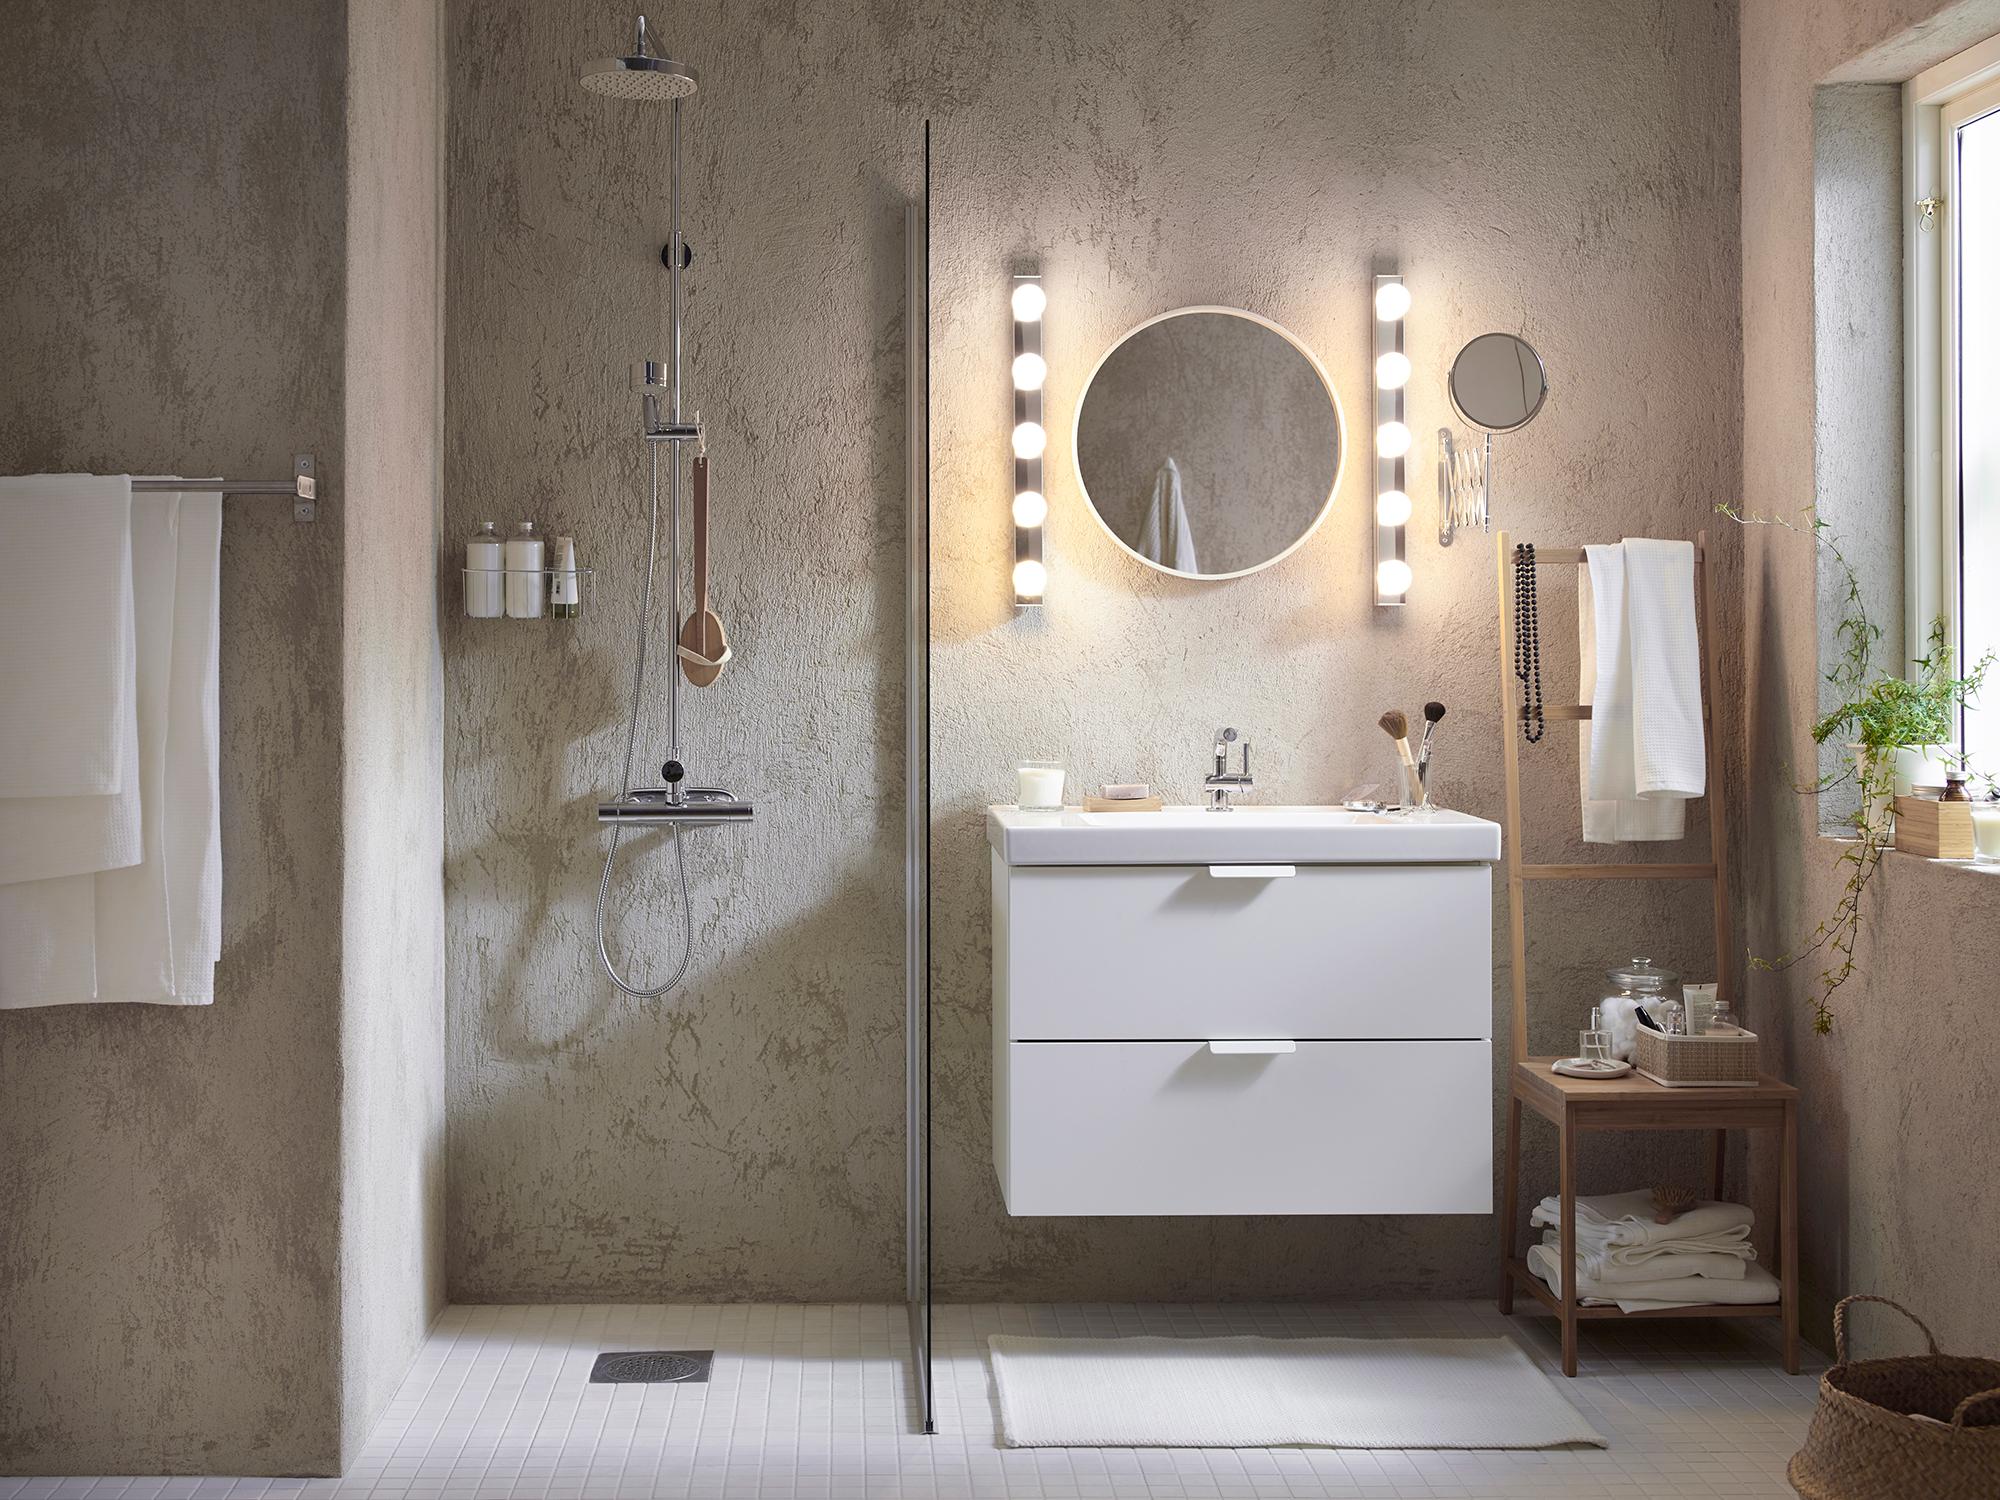 Best Kitchen Gallery: Bathroom Ideas Bathroom Designs And Photos of Ideas For Bathroom Design  on rachelxblog.com